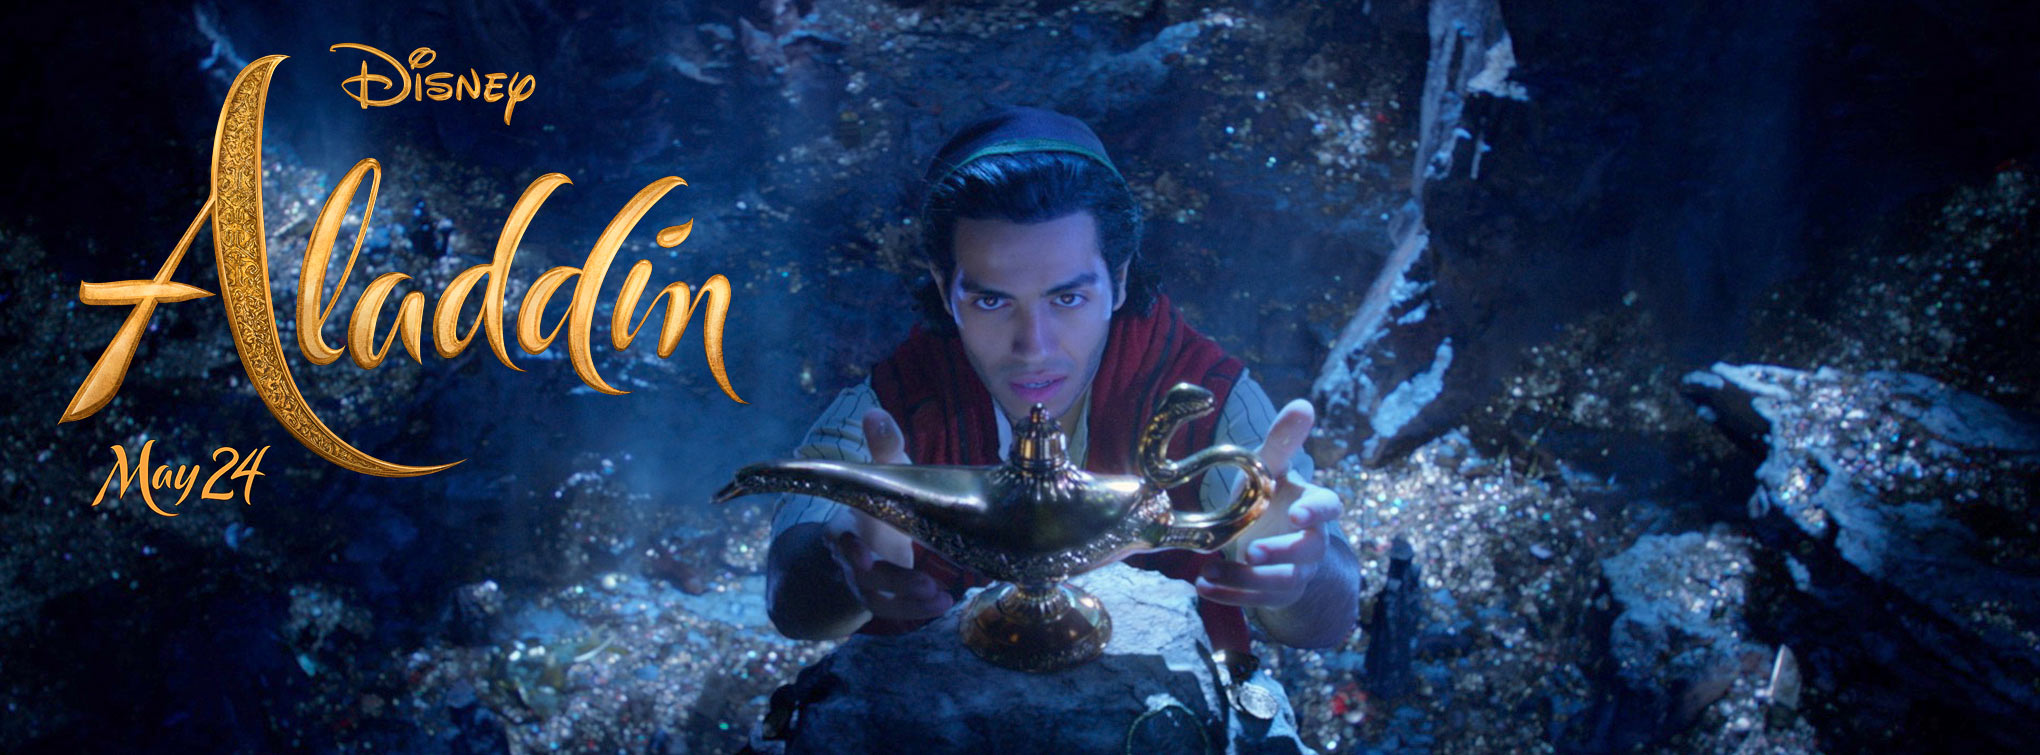 Slider image for Disney's Aladdin